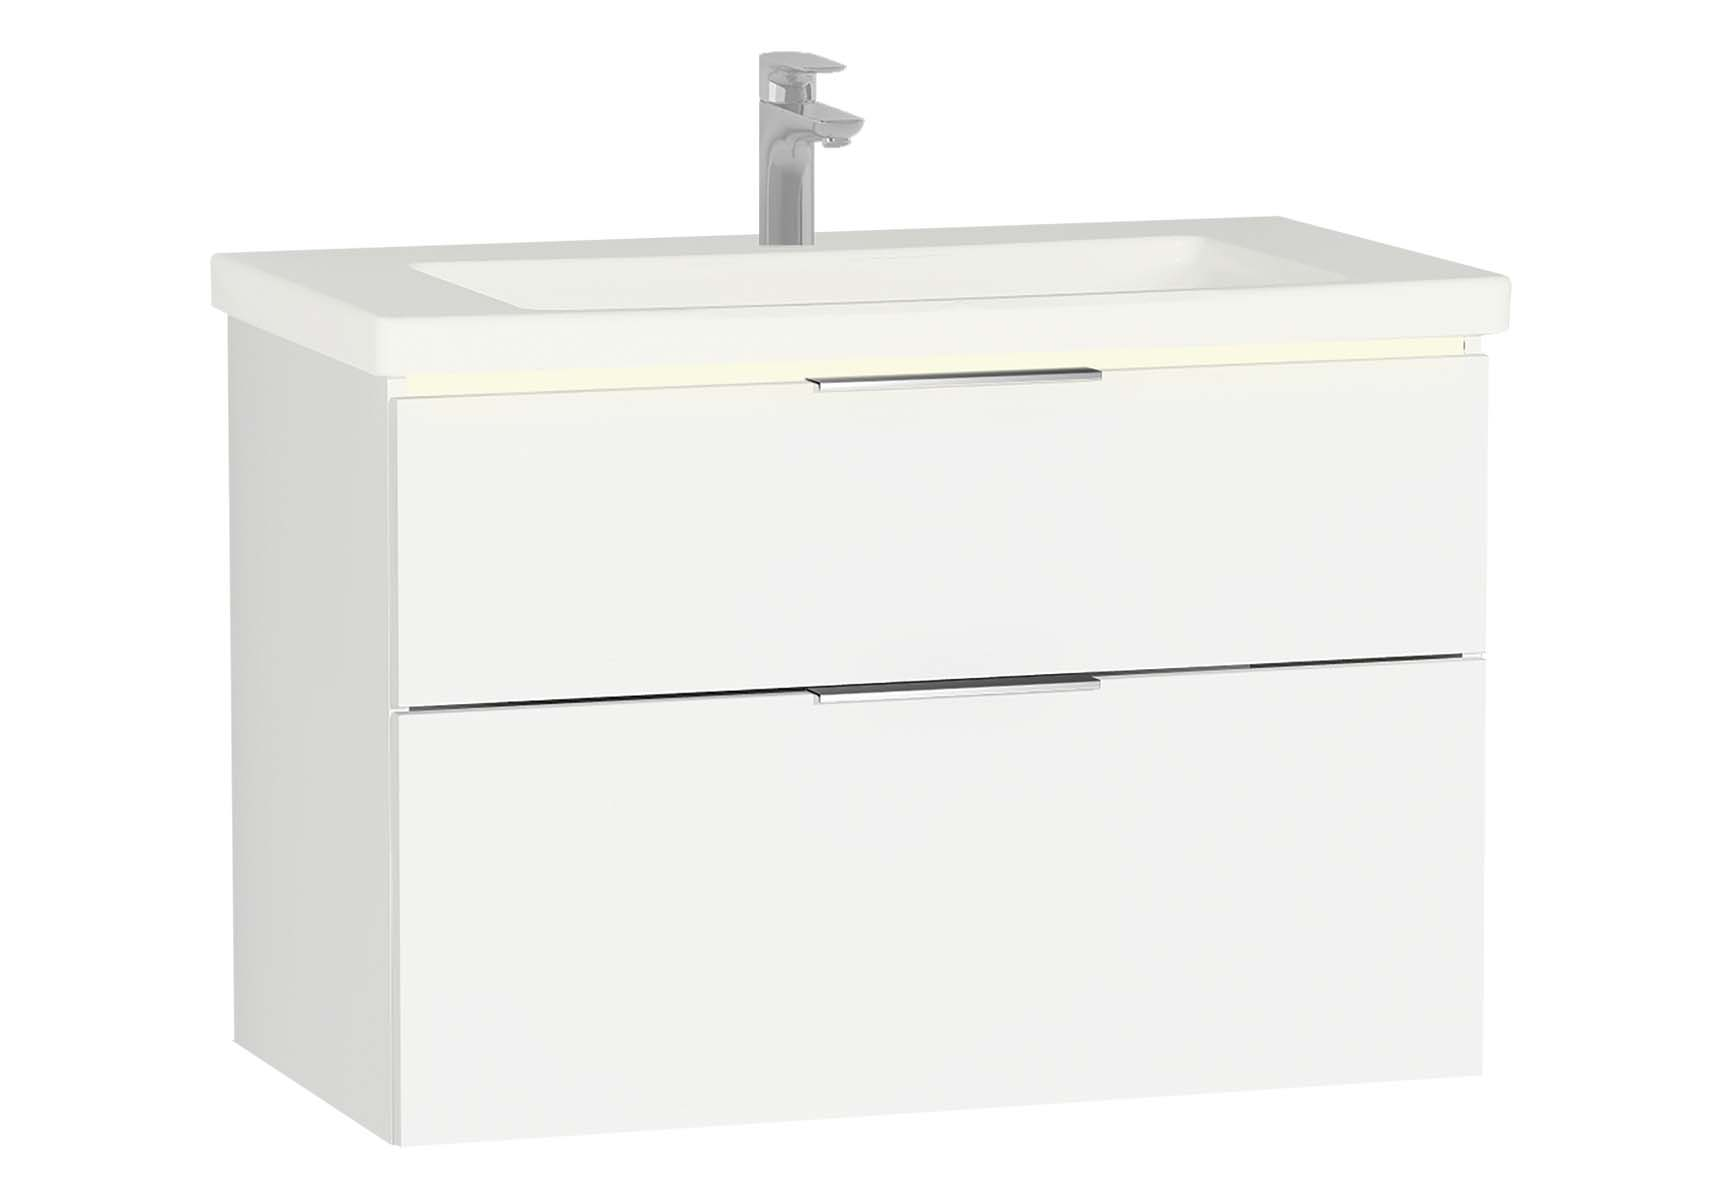 Central Washbasin Unit with 2 drawers, 90 cm, Golden Cherry, Ceramic Washbasin, Led